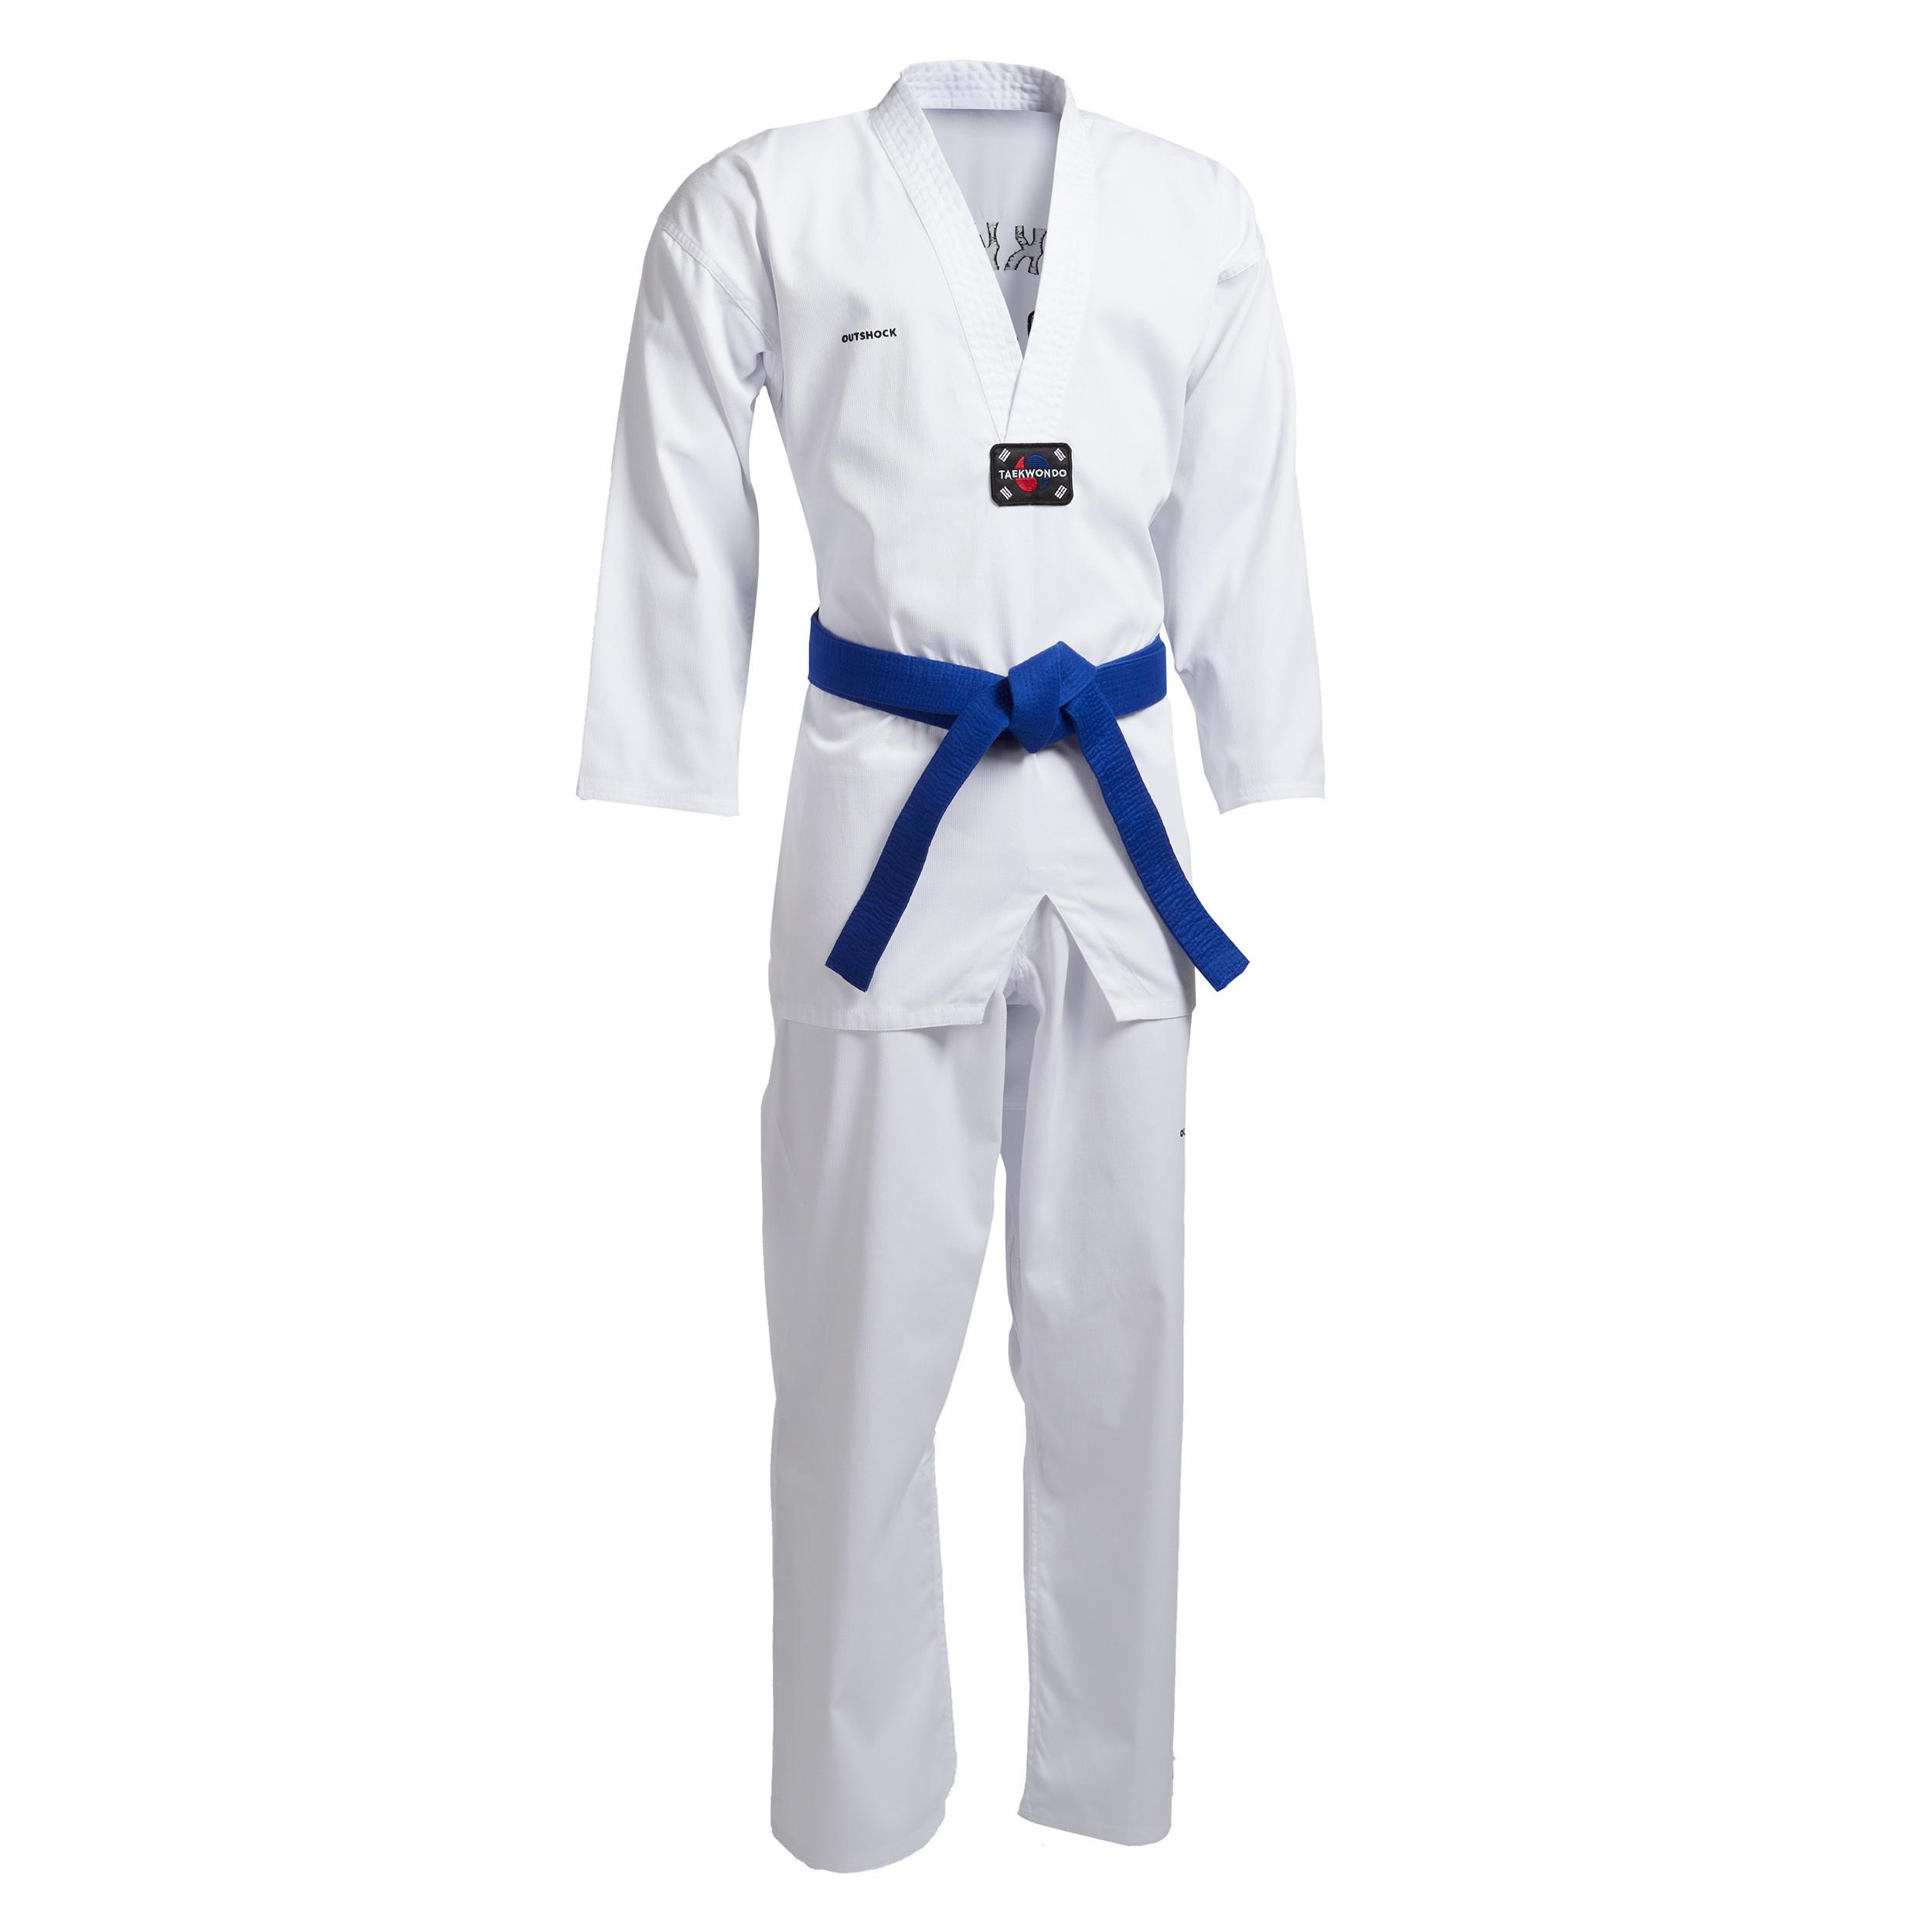 Taekwondo-Anzug 500 Erwachsene| LIEFERUNG OHNE GÜRTEL | Sportbekleidung > Sportanzüge > Taekwondo-Anzüge | Outshock